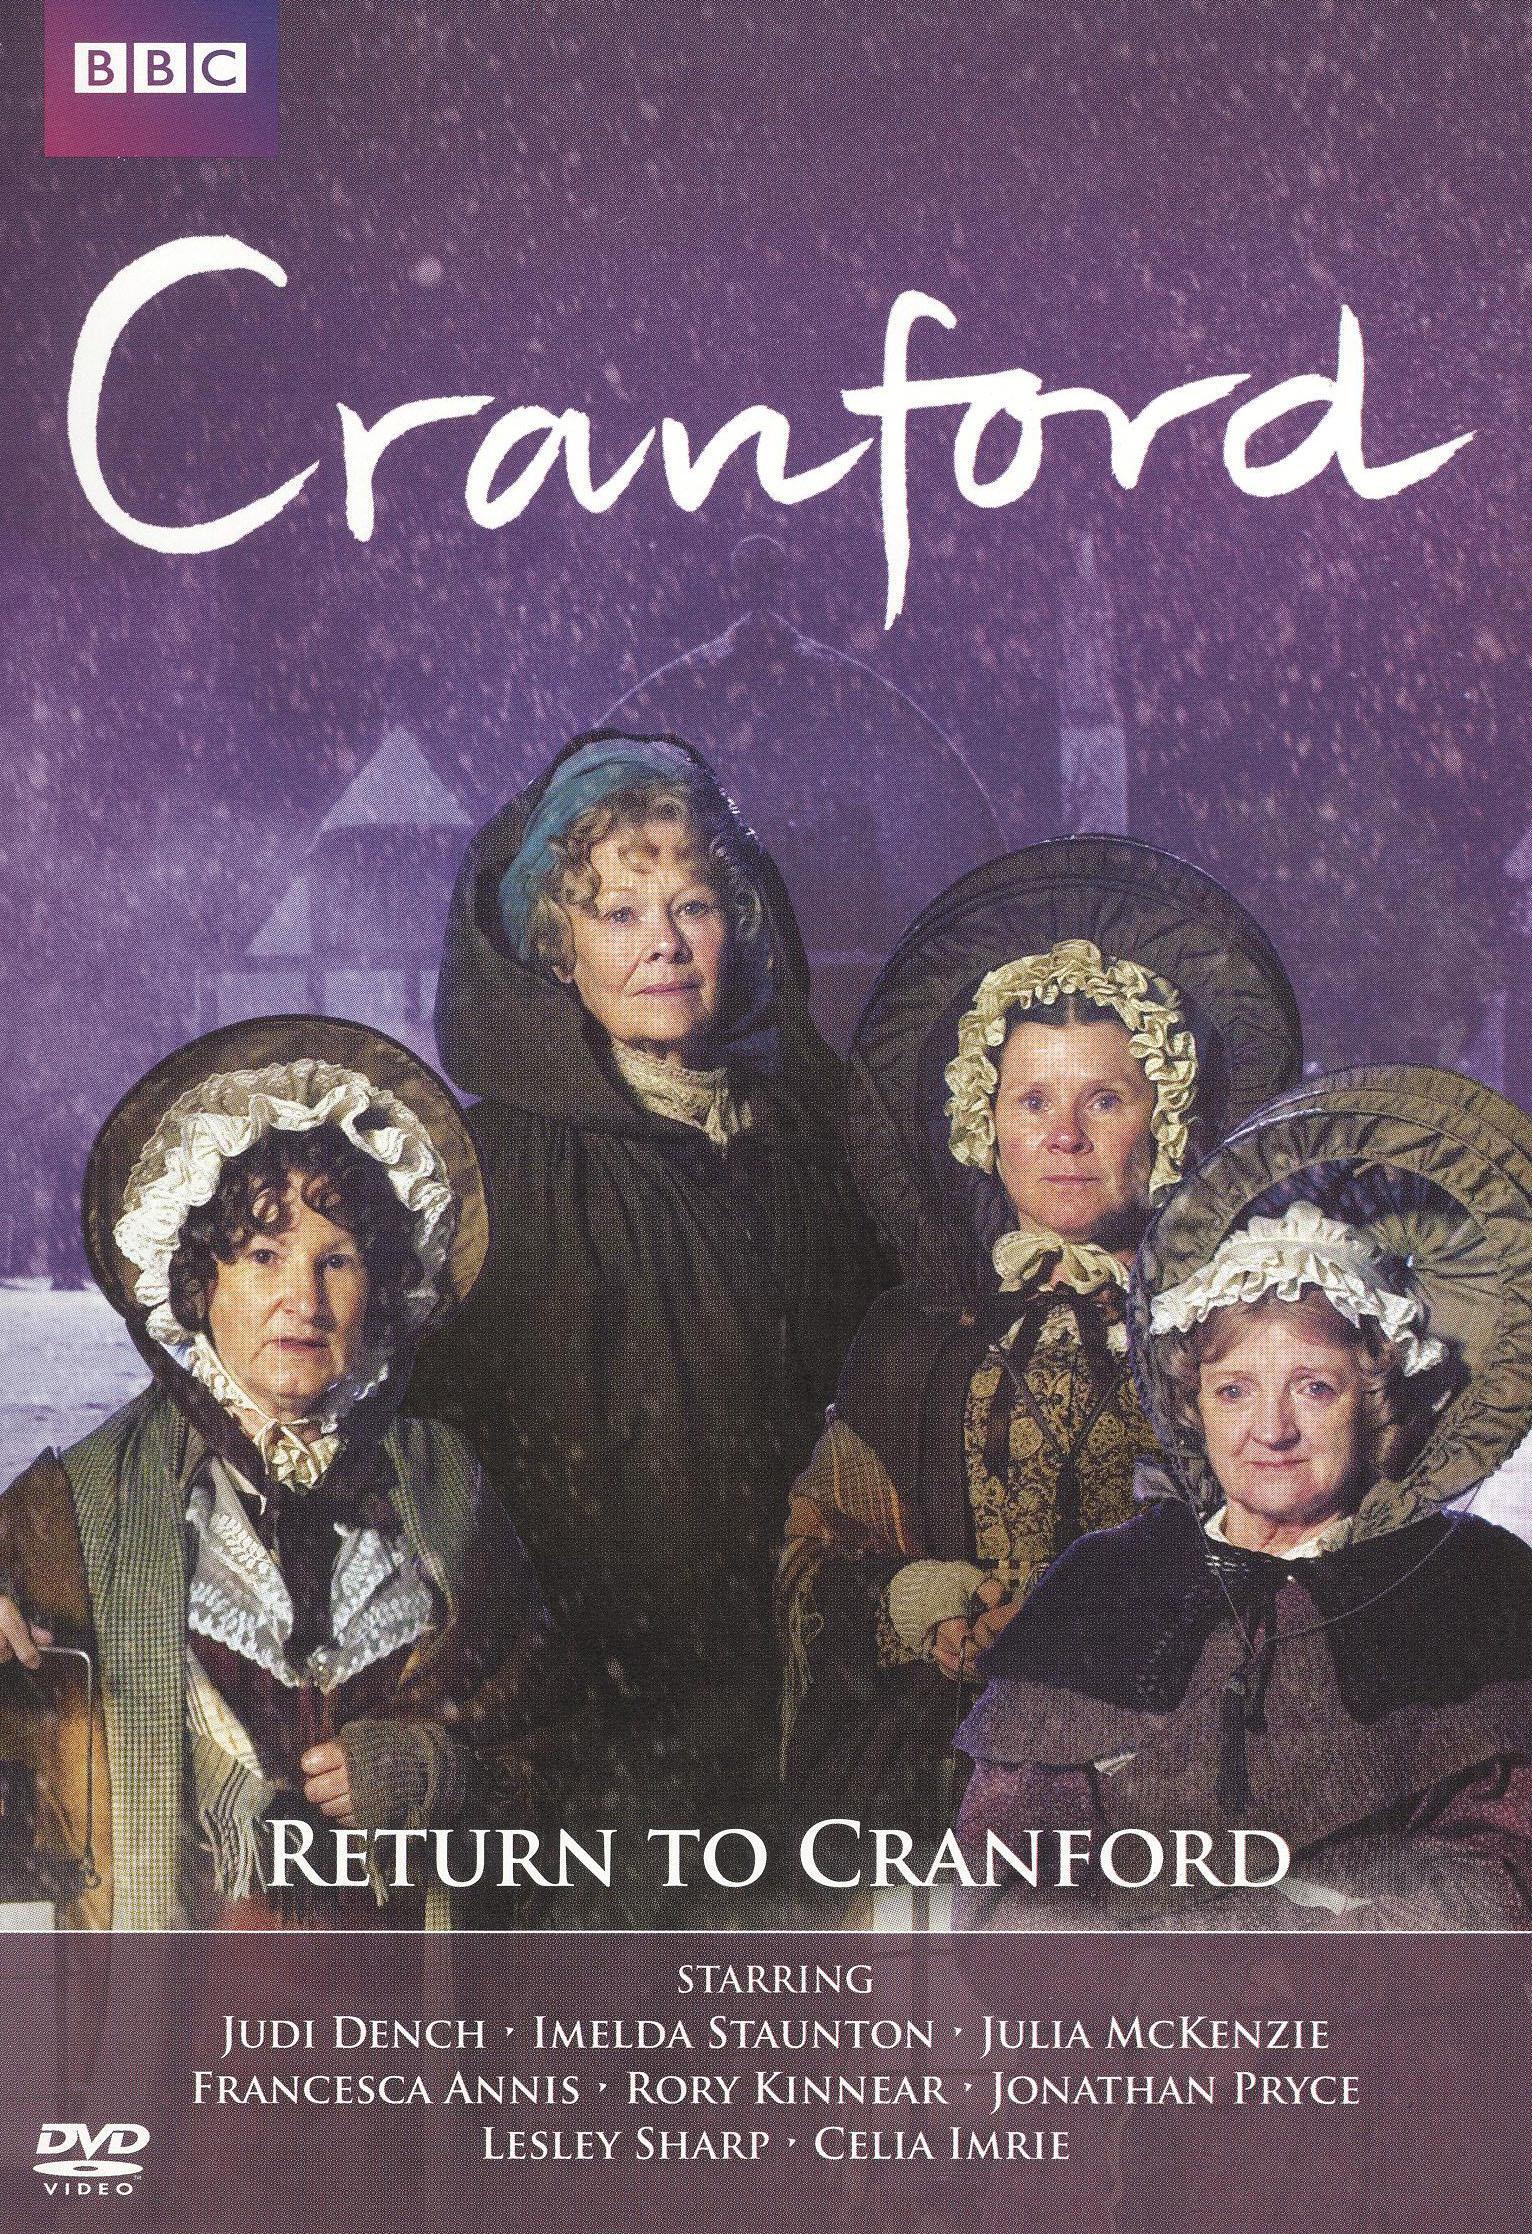 Cranford: Return To Cranford (dvd) 18316854